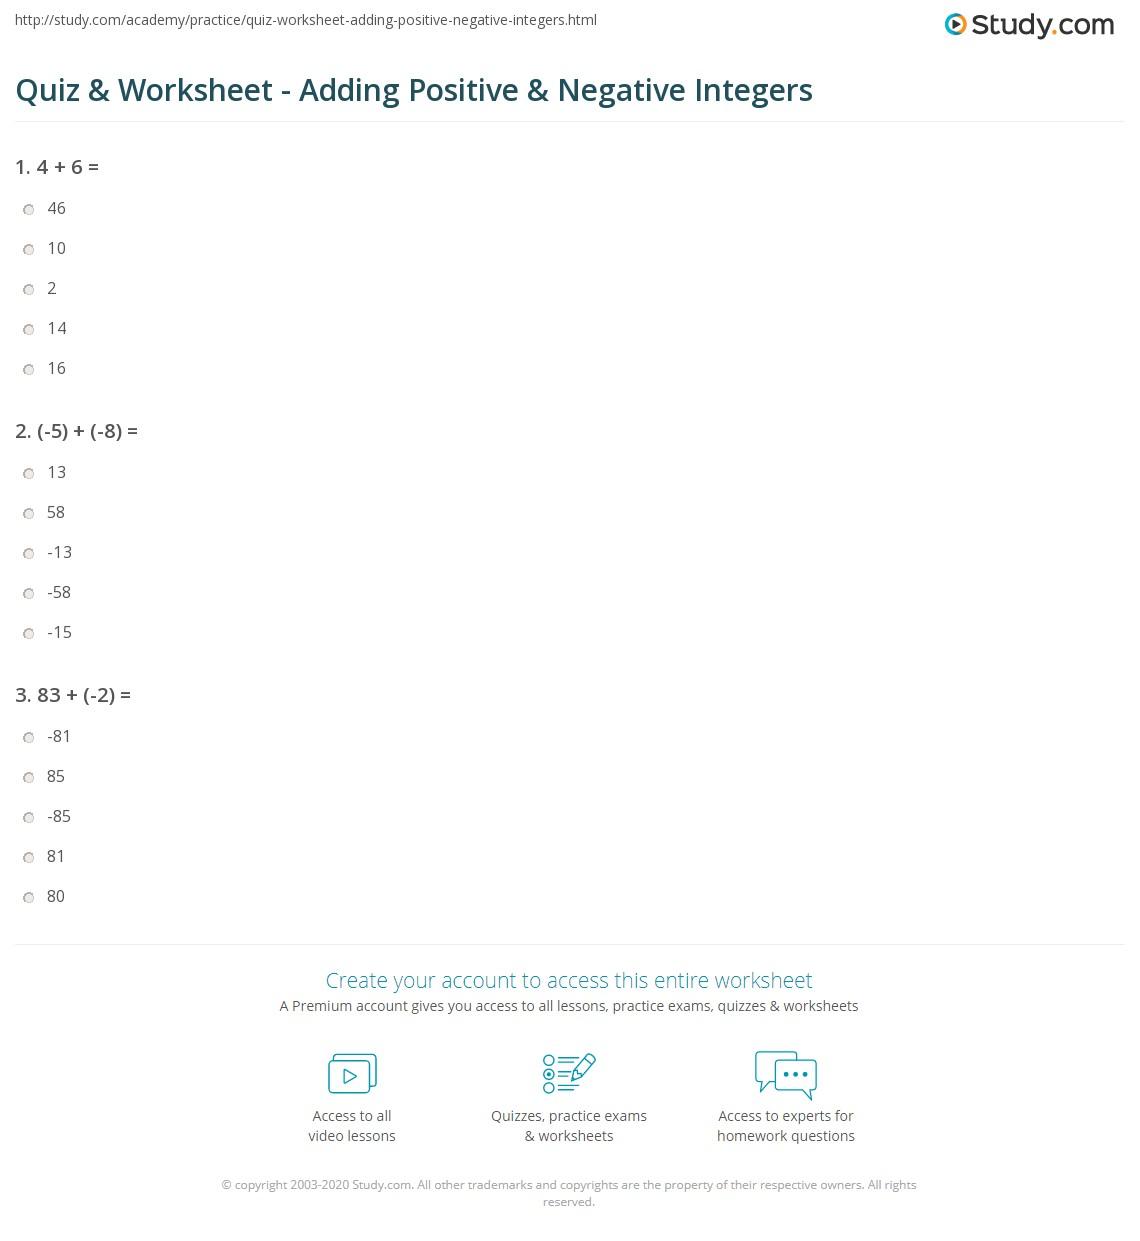 hight resolution of Quiz \u0026 Worksheet - Adding Positive \u0026 Negative Integers   Study.com